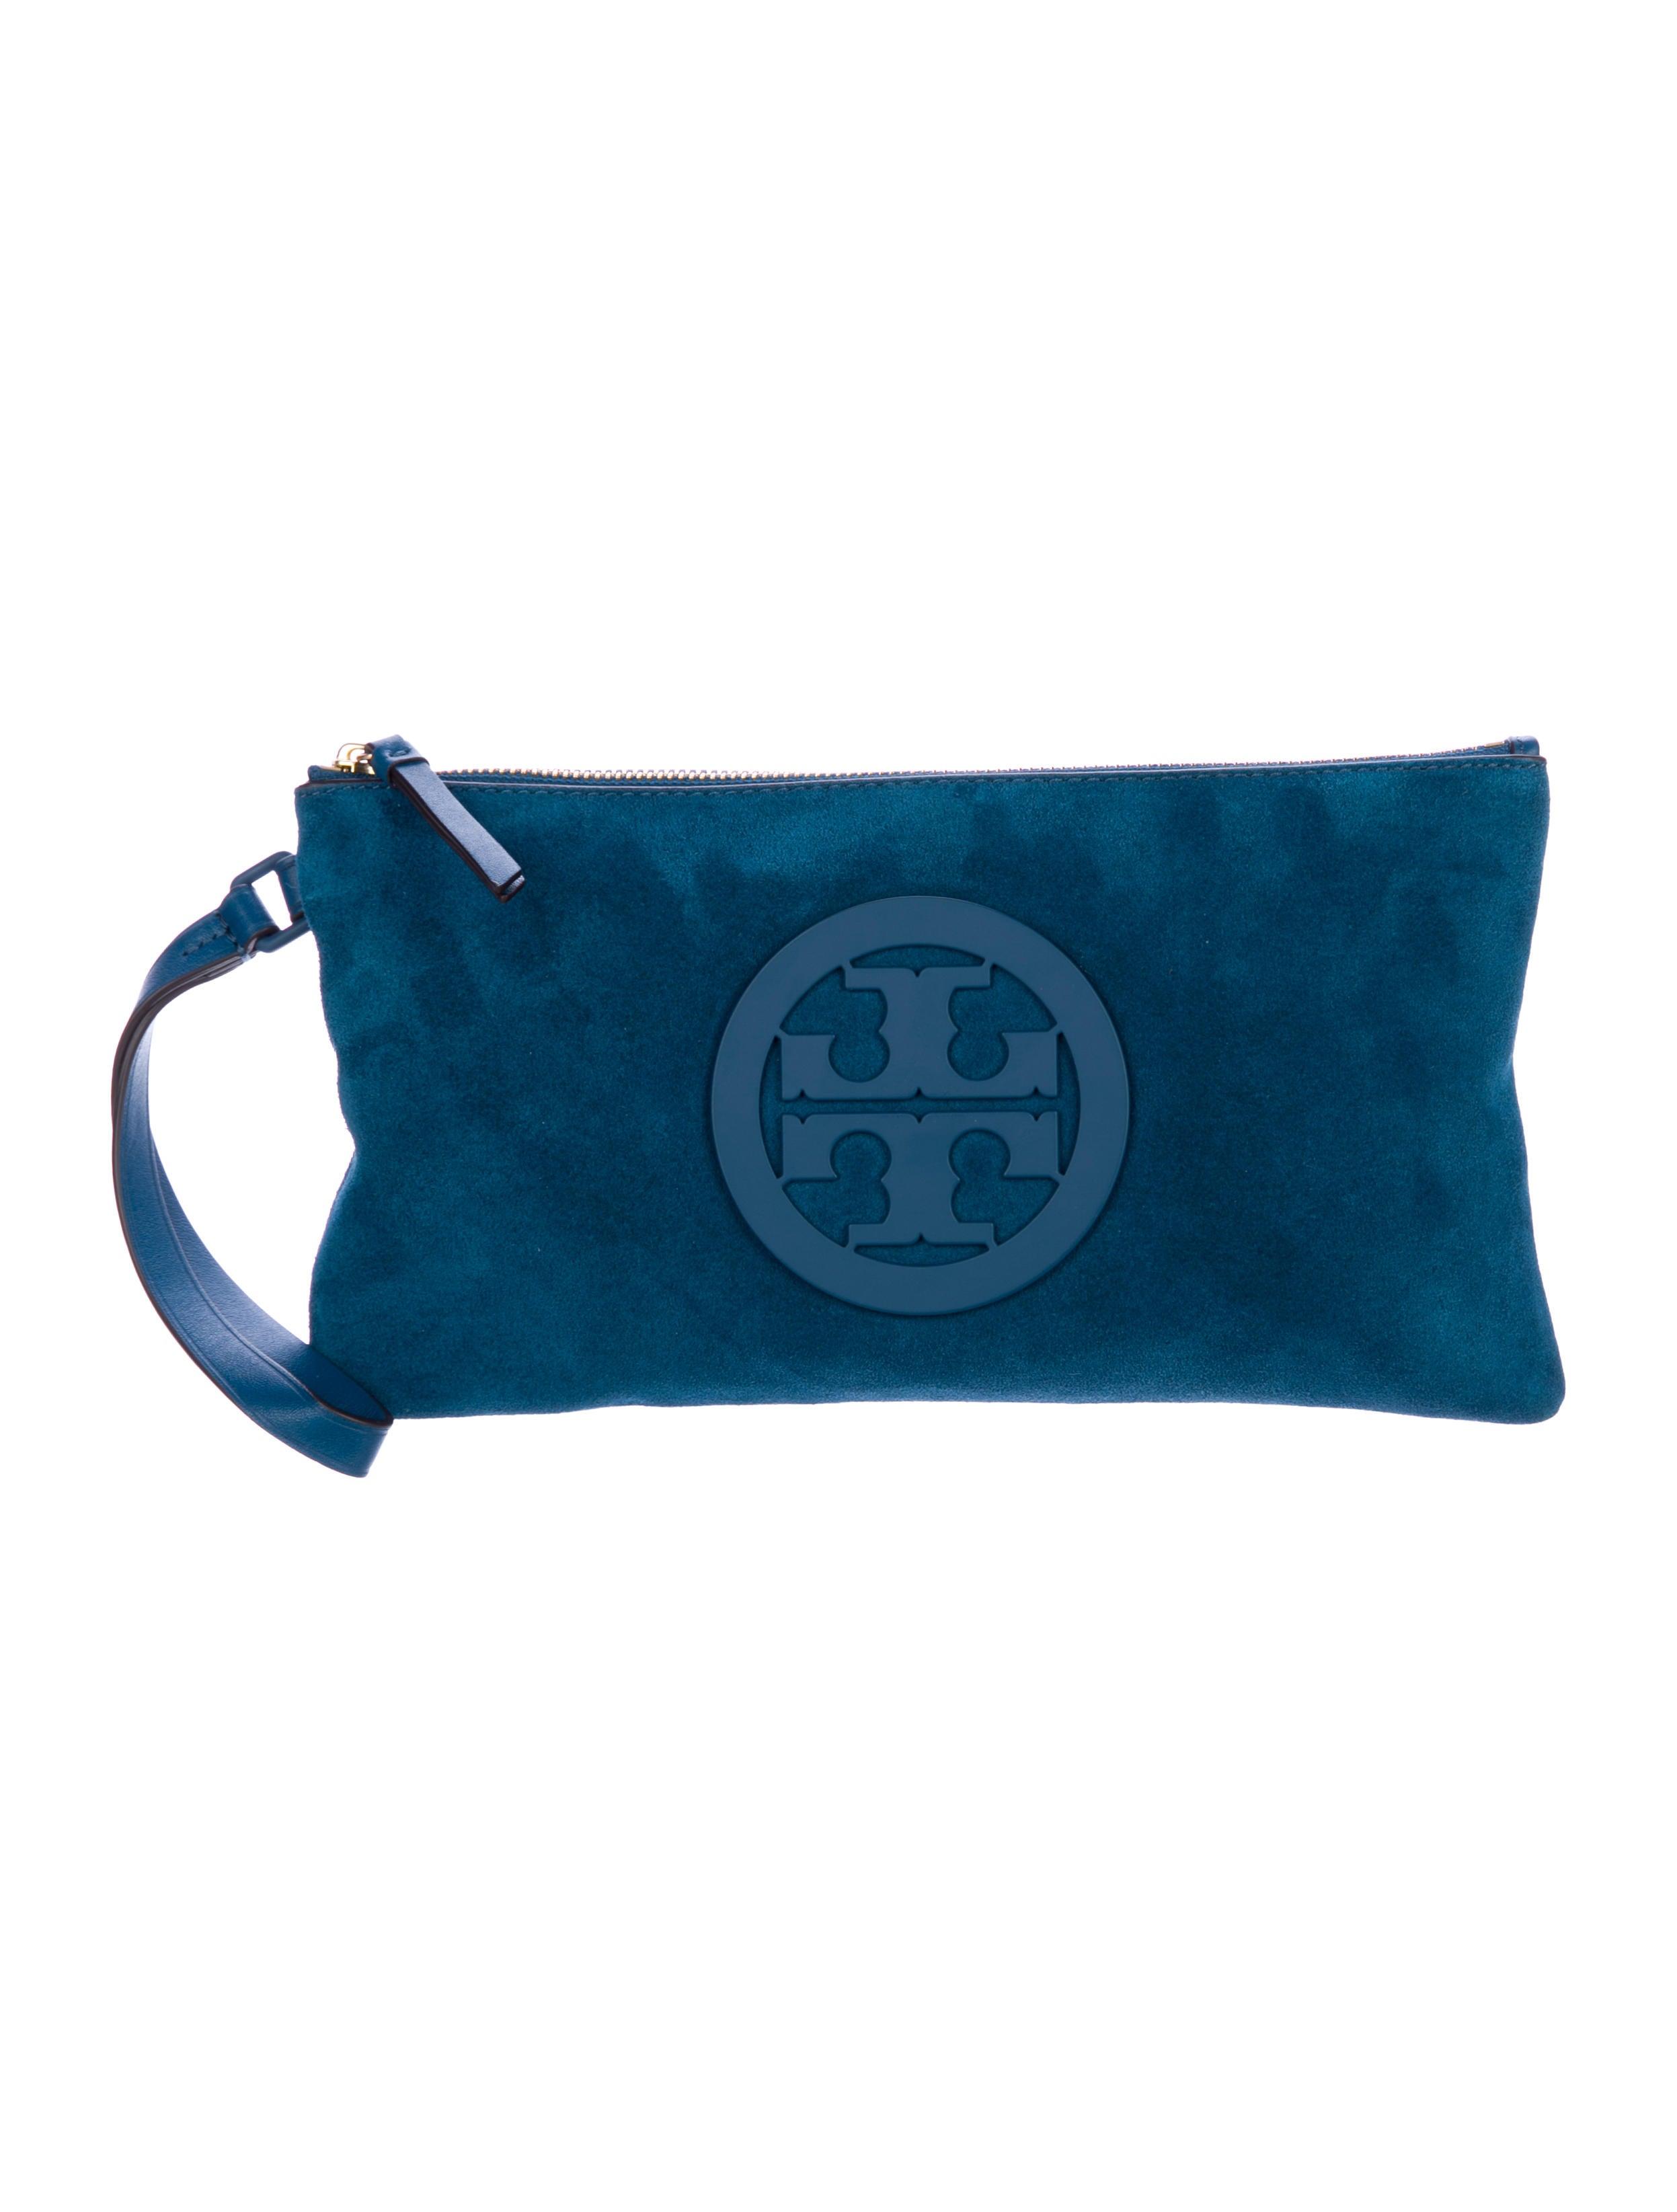 5901092aa73 Tory Burch Charlie Leather   Suede Clutch - Handbags - WTO141967 ...